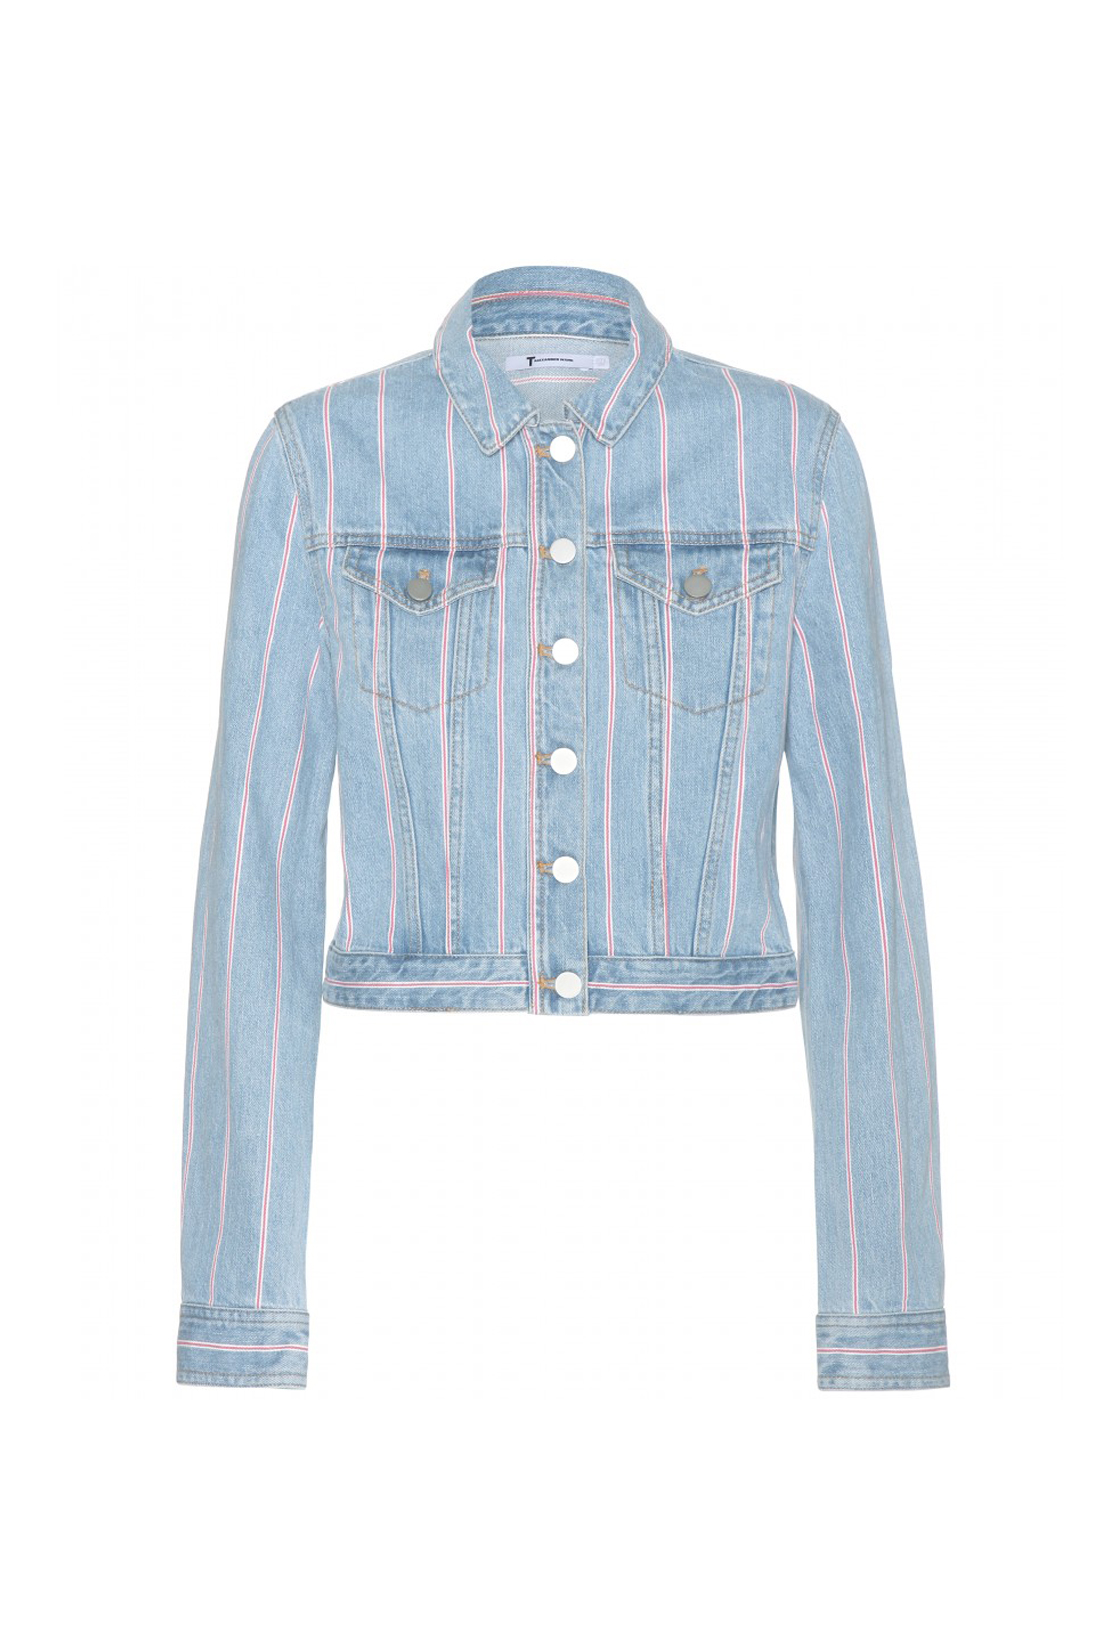 08-spring-denim-trends-shrunken-jackets-01.jpg